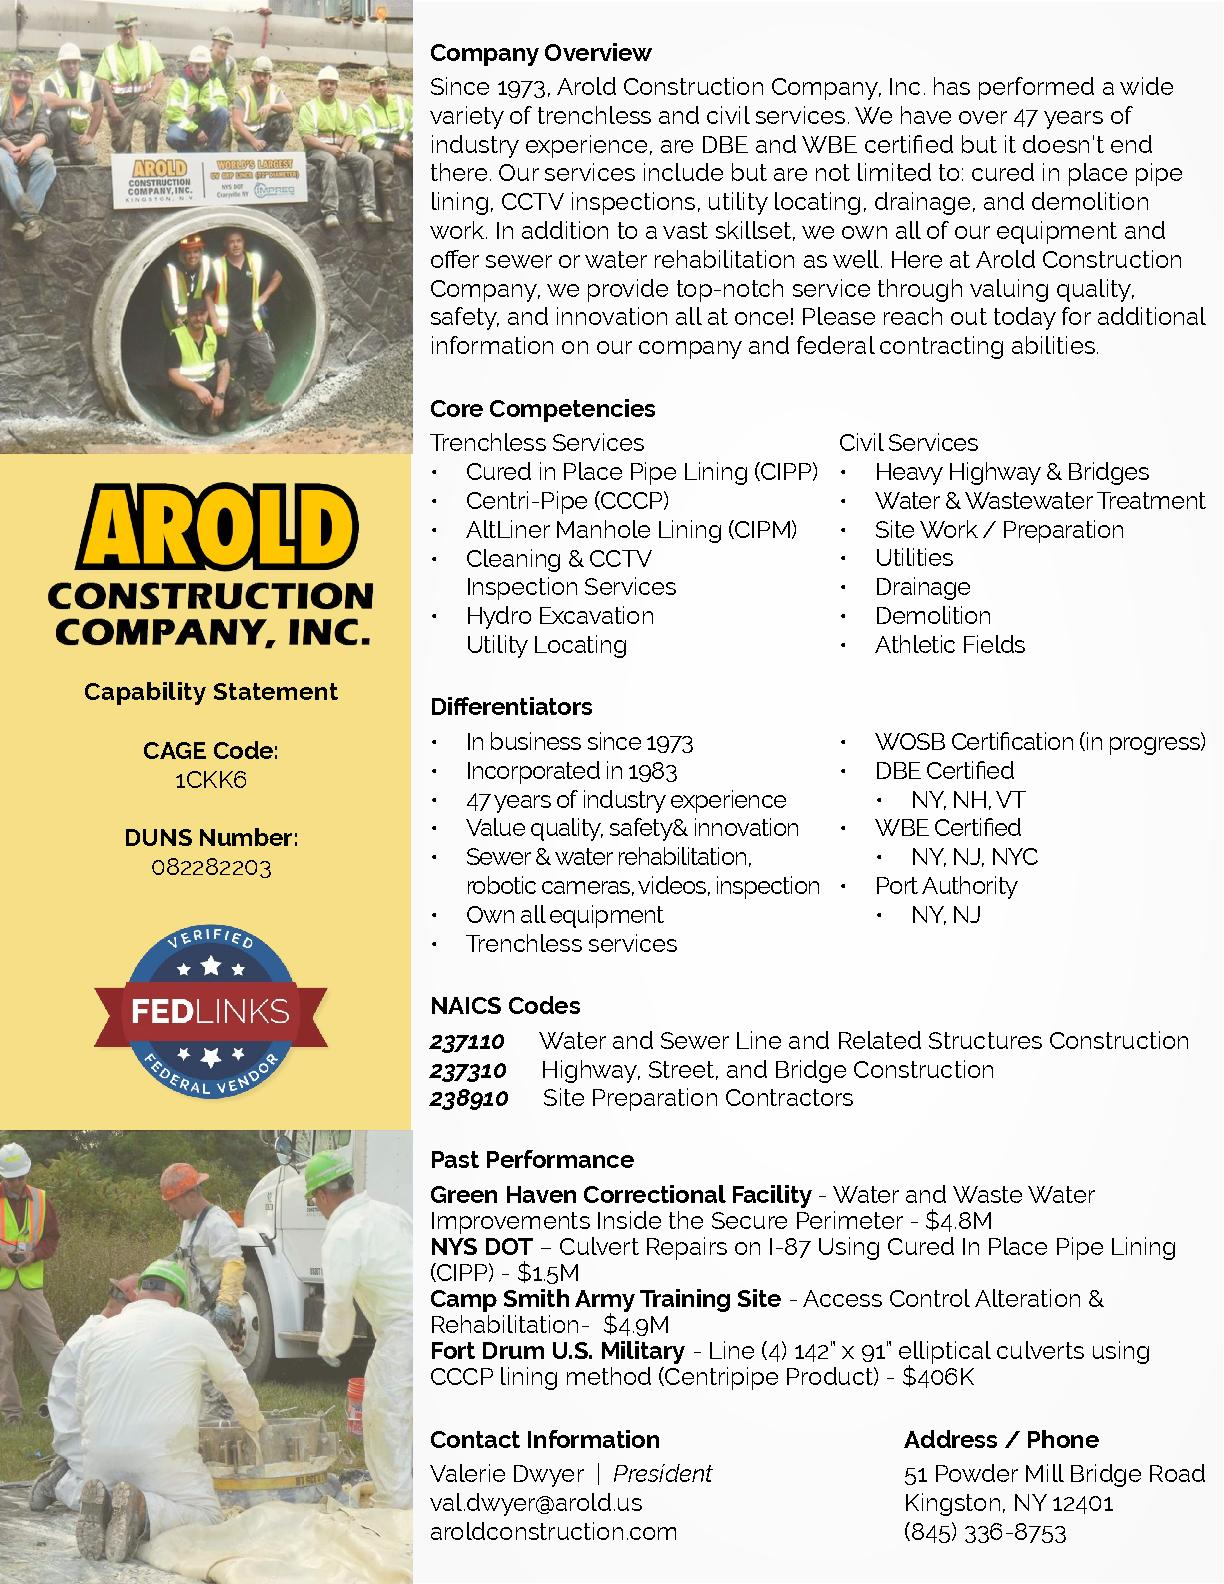 Arold construction company inc. capability statement